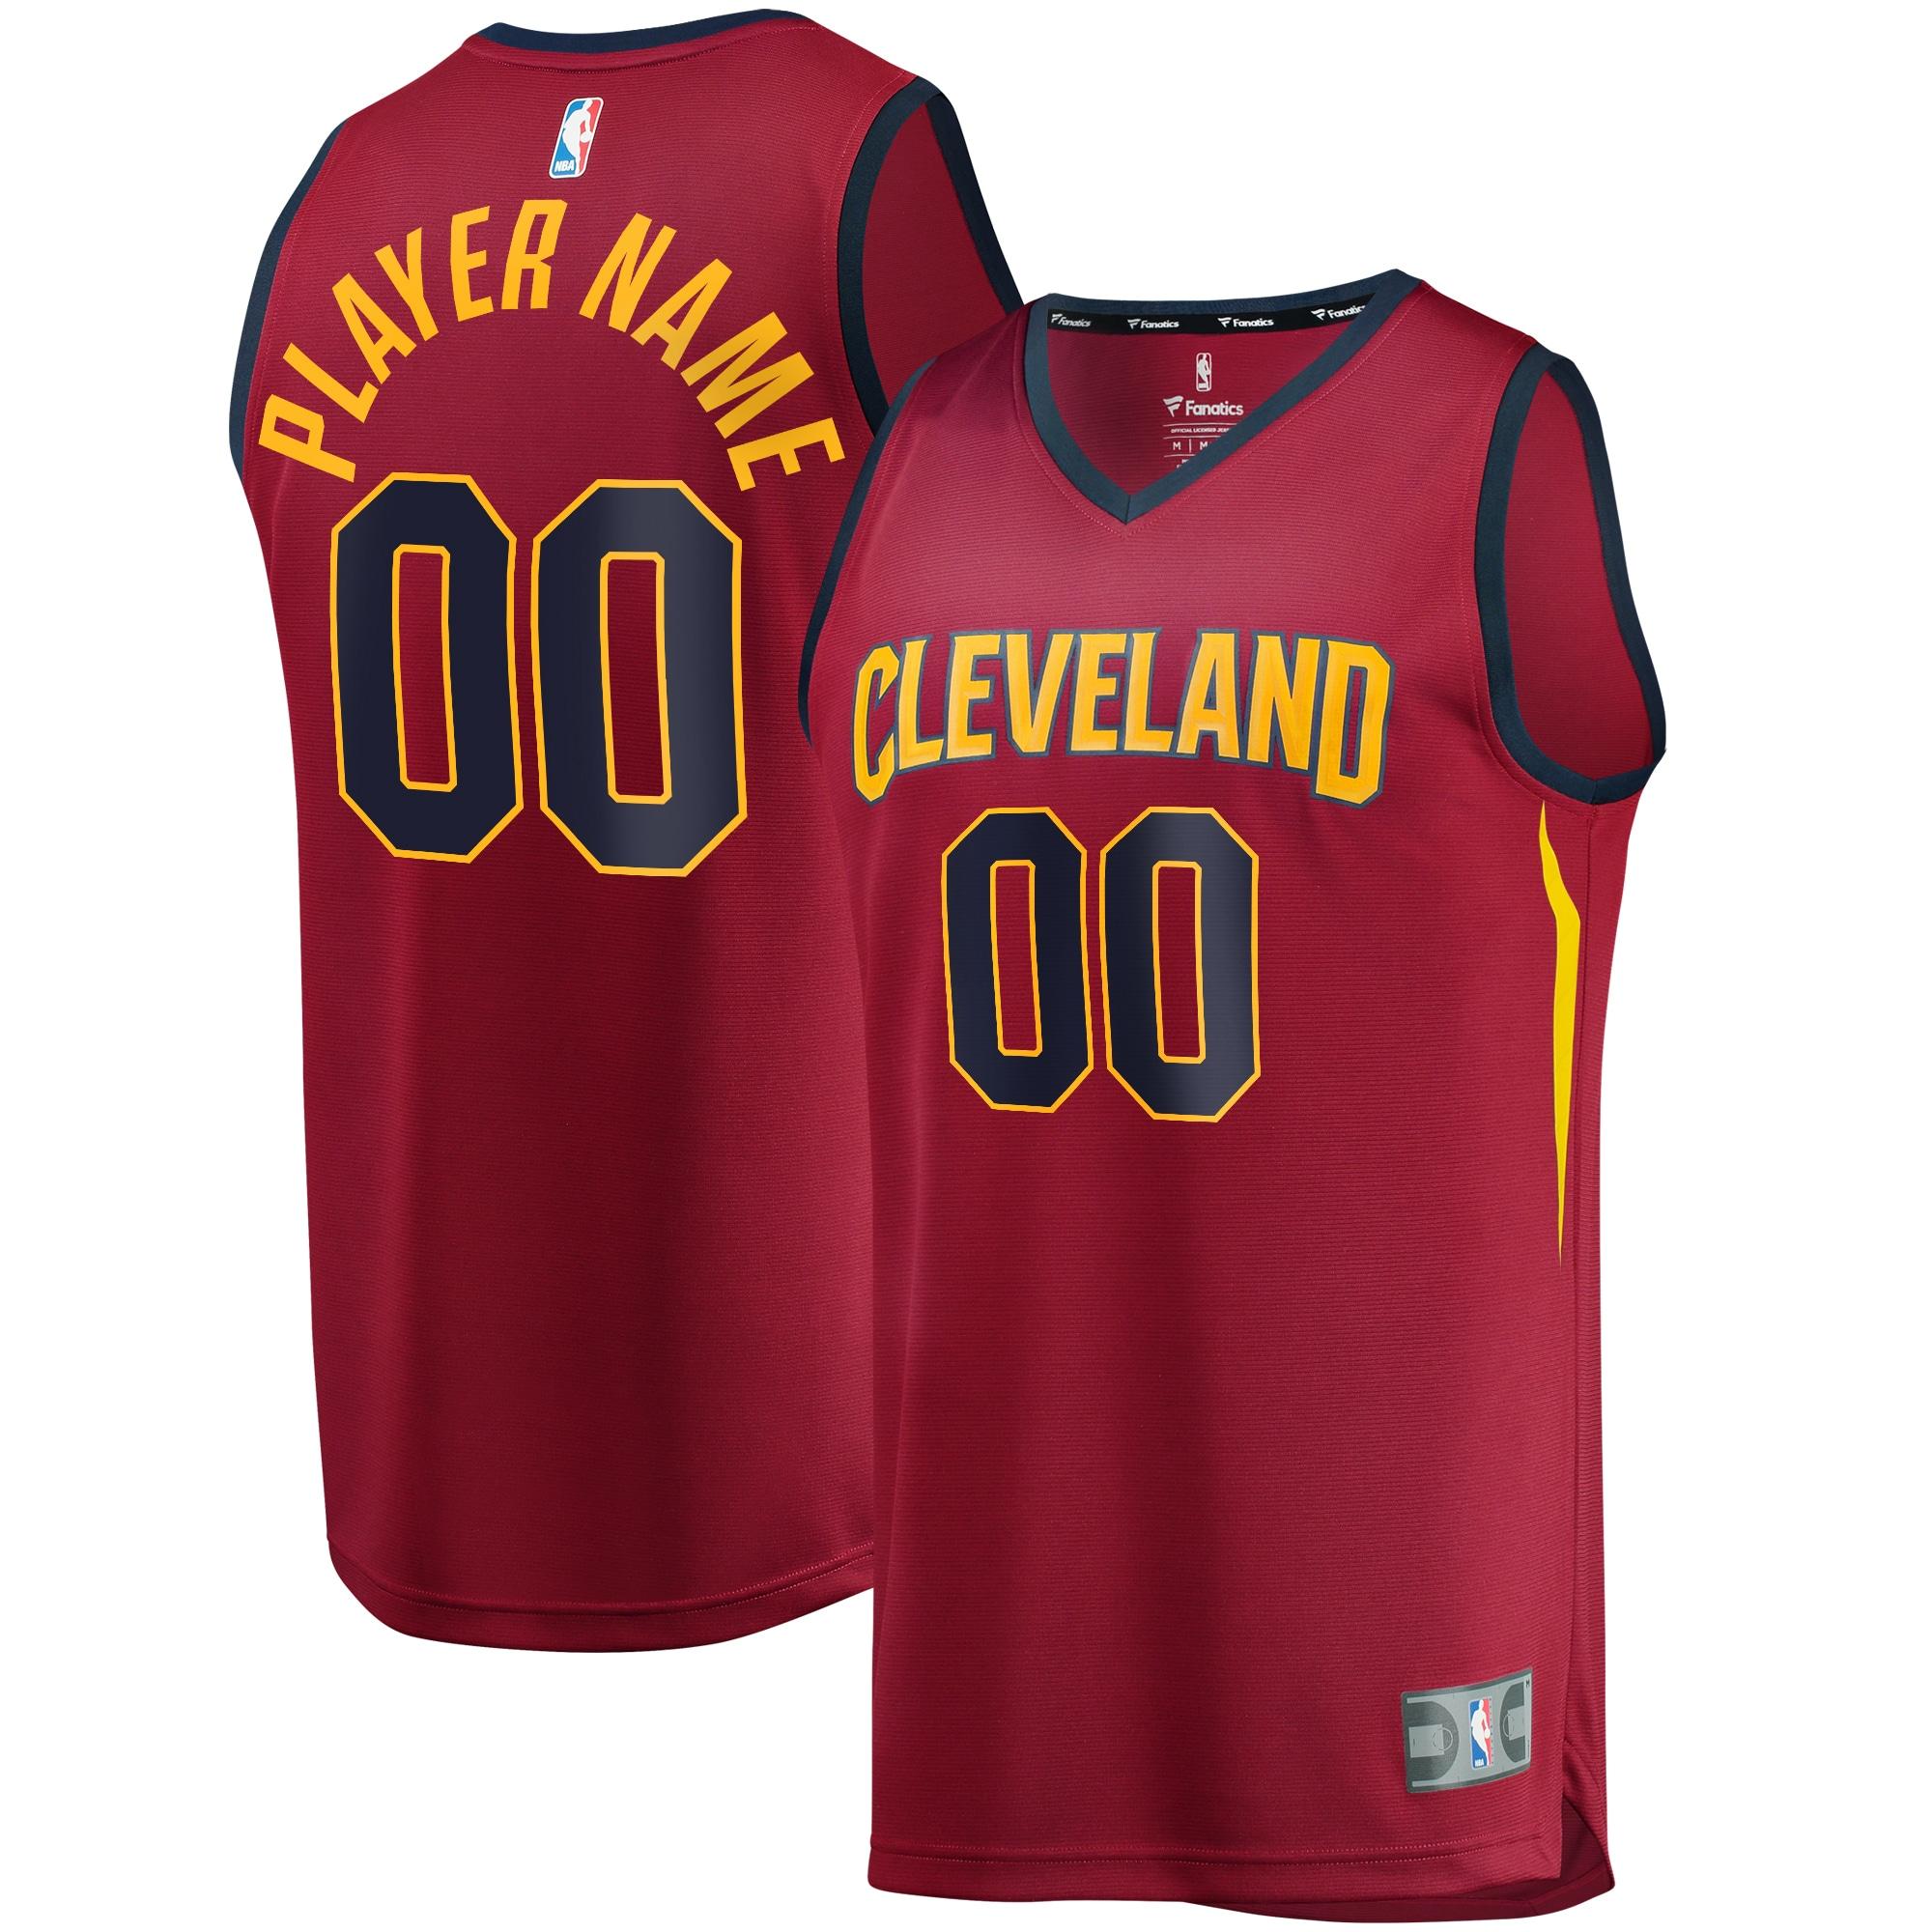 Cleveland Cavaliers Fanatics Branded Fast Break Custom Replica Jersey Wine - Icon Edition